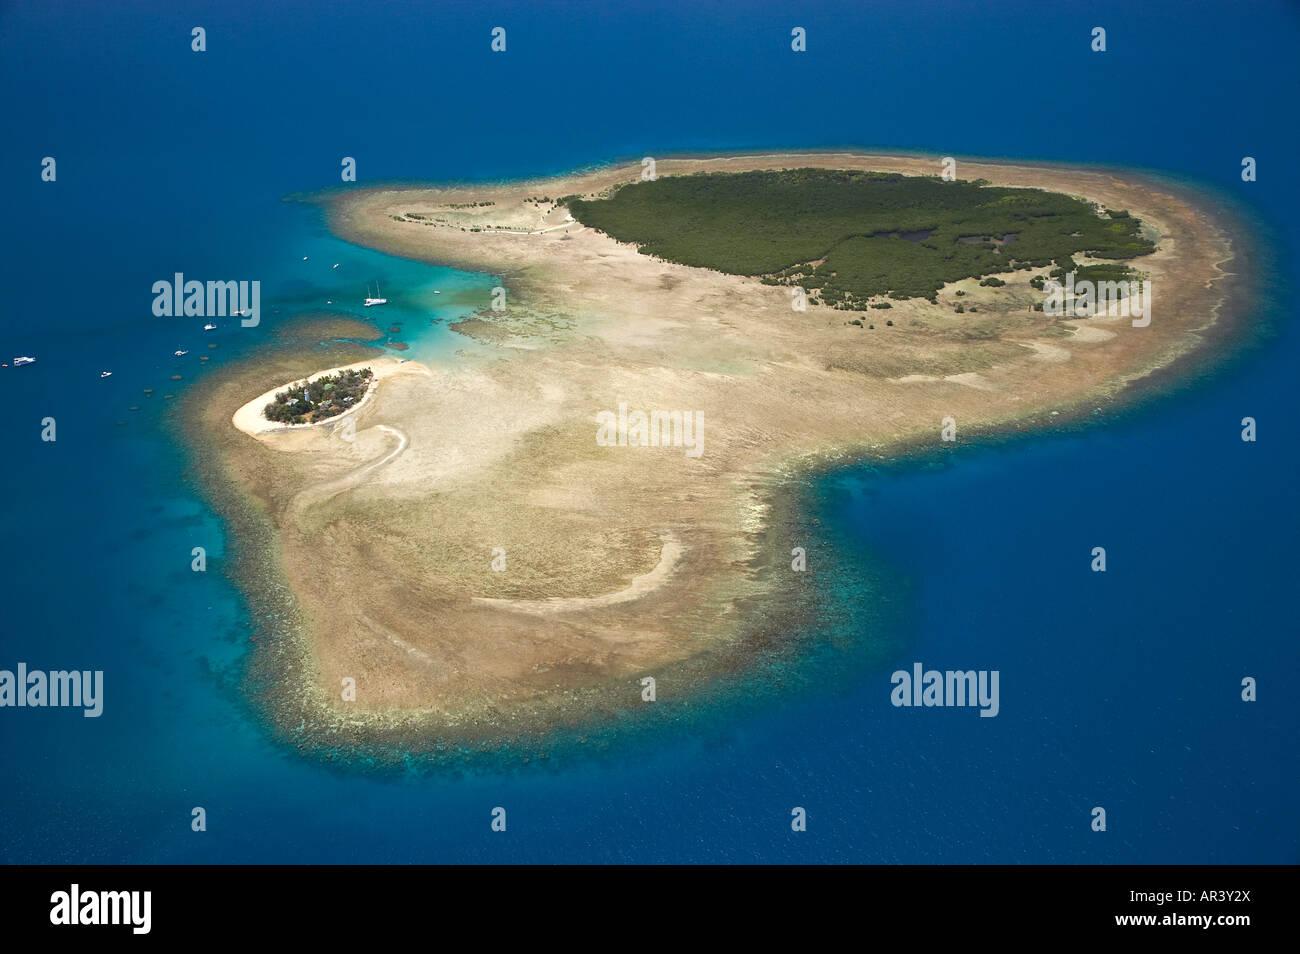 Low Isles reef in shape of map of Australia Great Barrier Reef Marine Park near Port Douglas North Queensland Australia - Stock Image